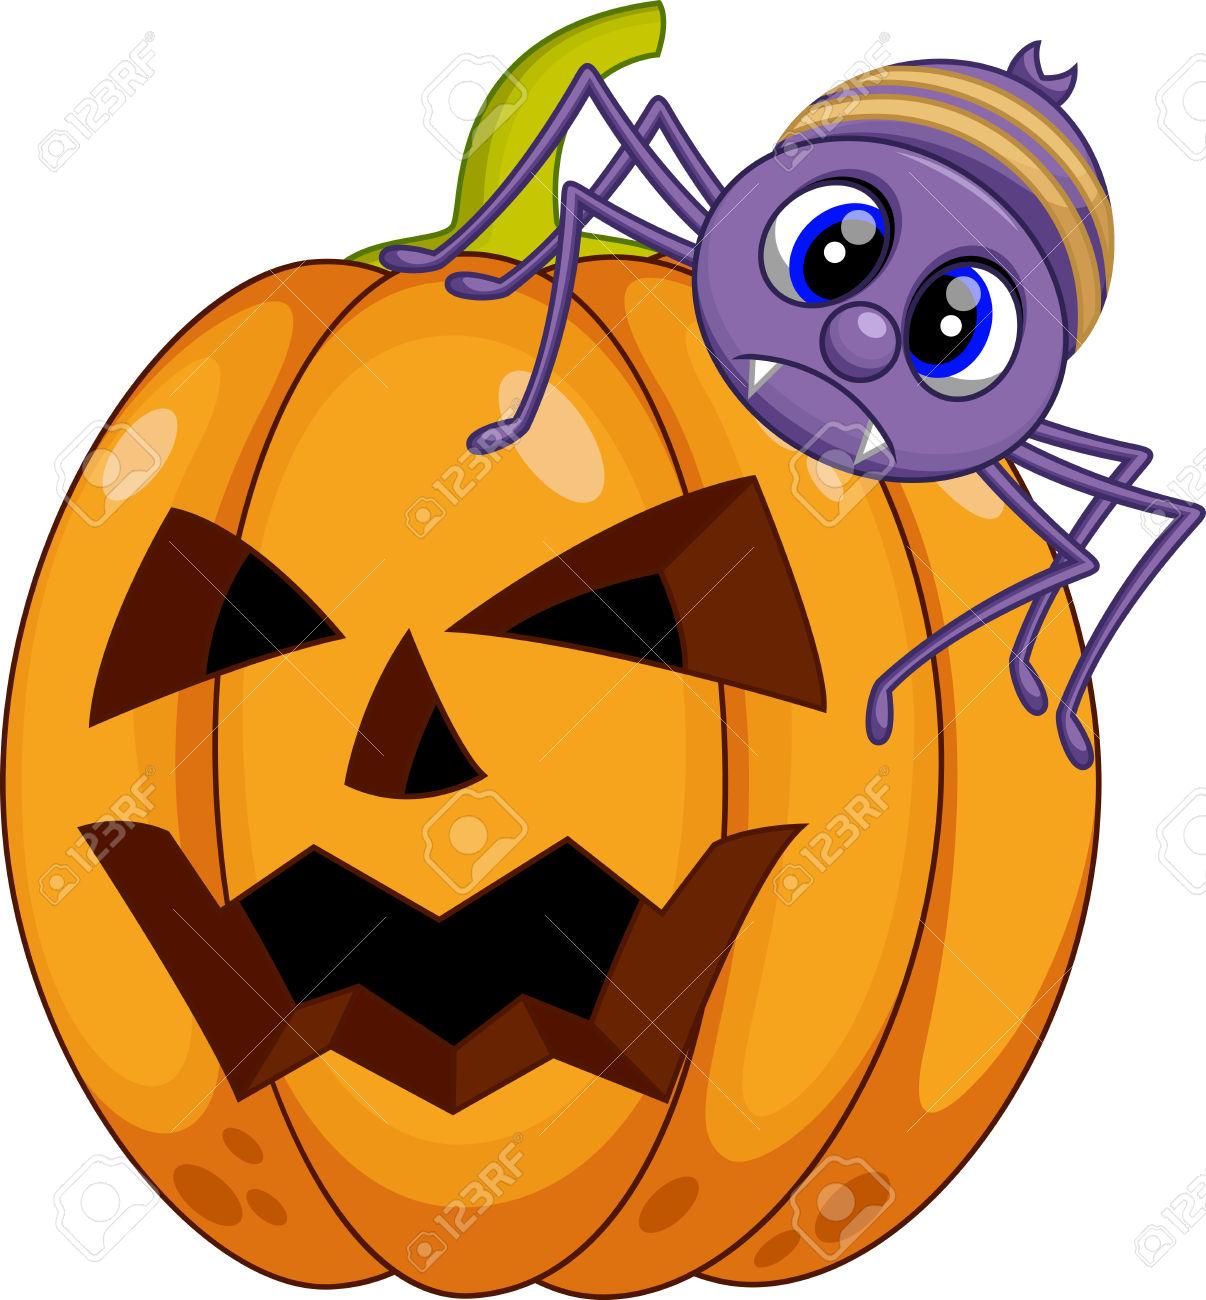 Pumpkin And Spider Cartoon Royalty Free Cliparts, Vectors, And.